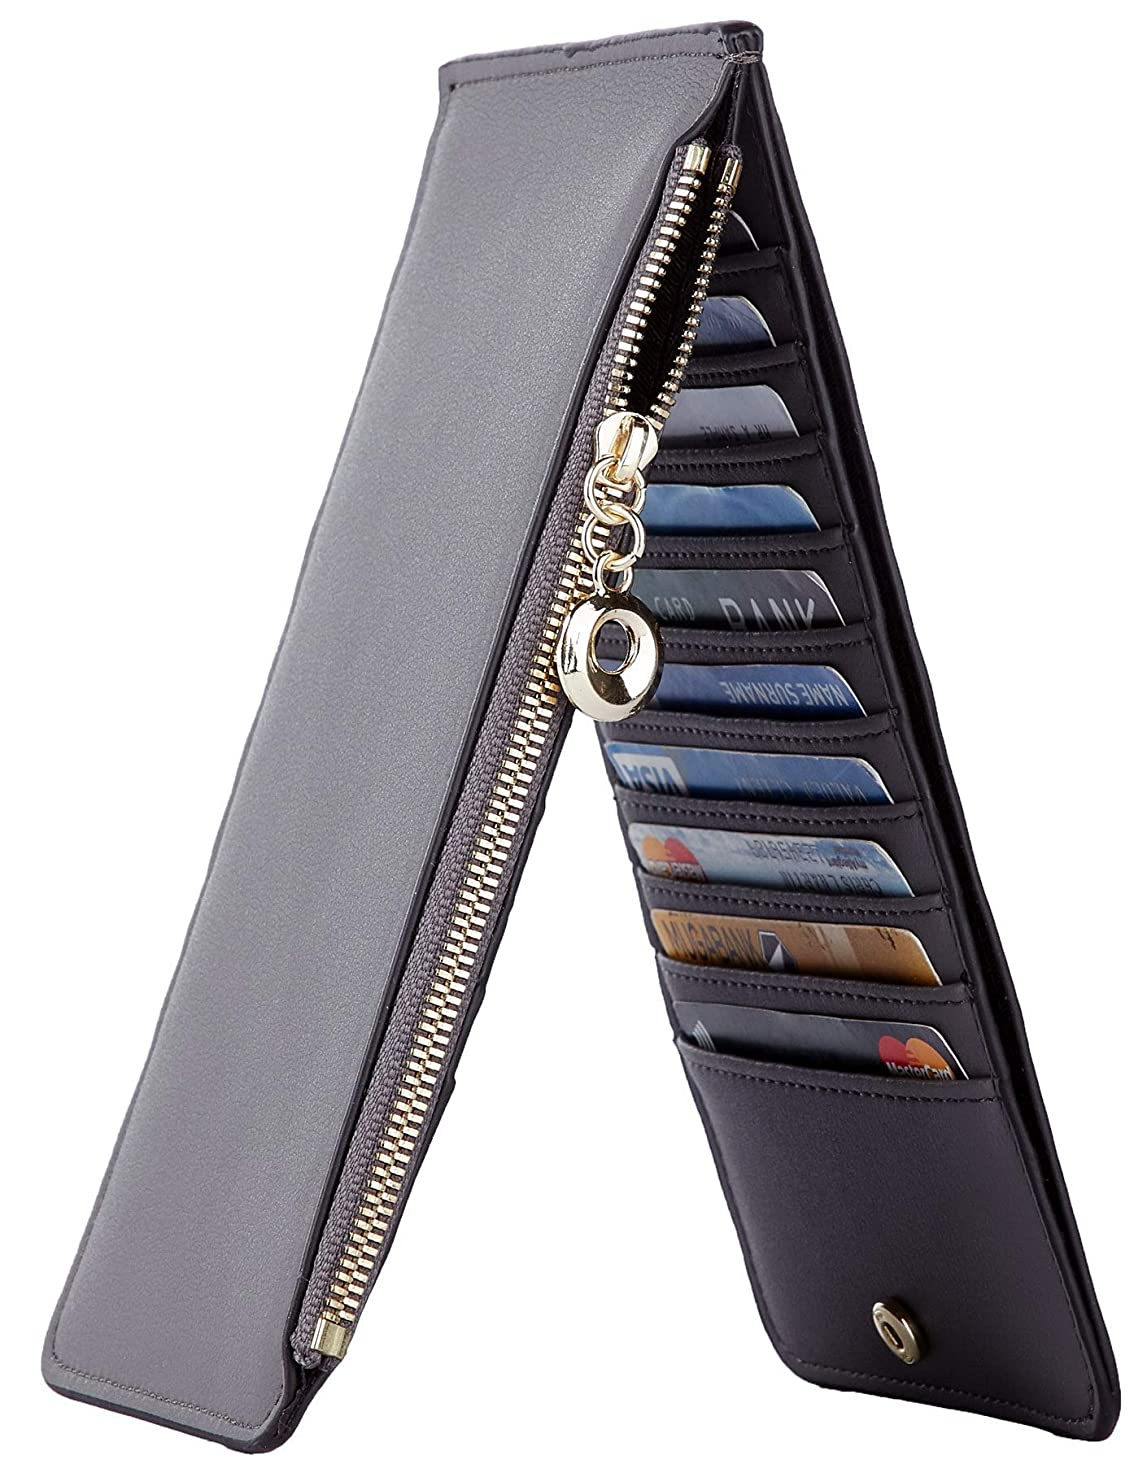 NapaWalli Womens RFID Blocking Genuine Leather Multi Card Organizer Wallet with Zipper Pocket